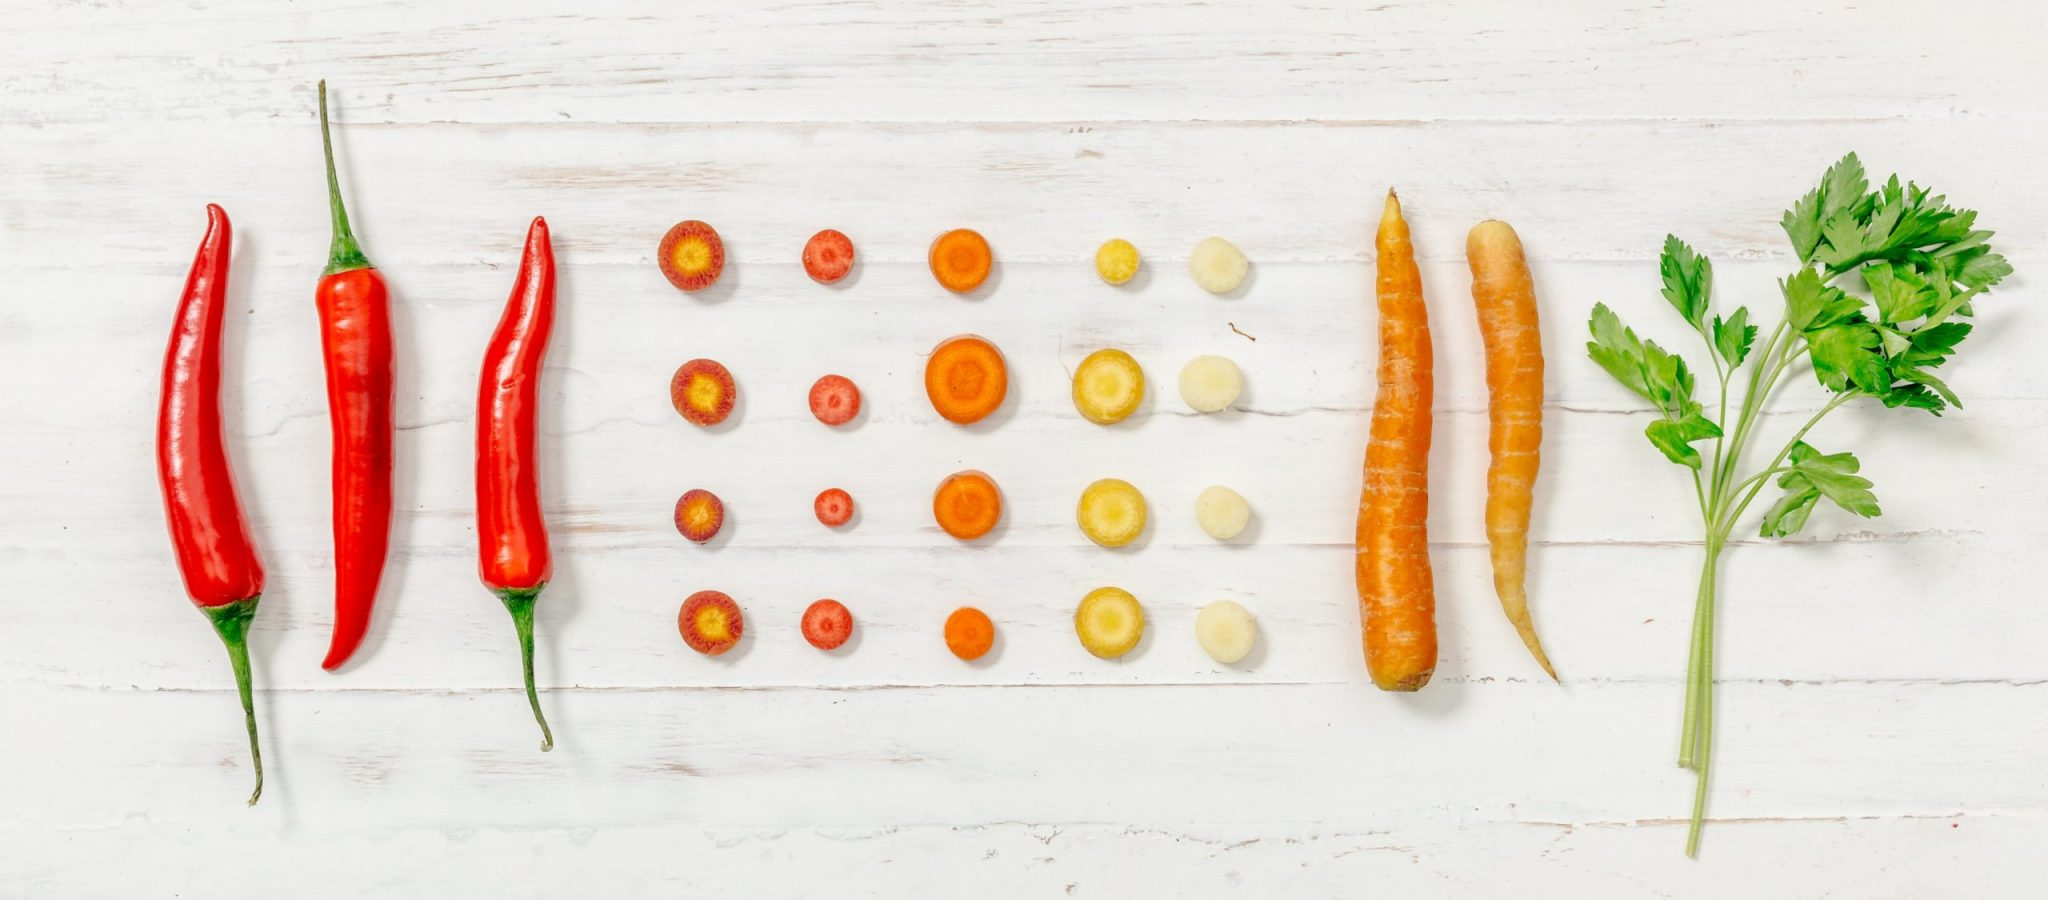 red-orange-yellow-green-vegatables